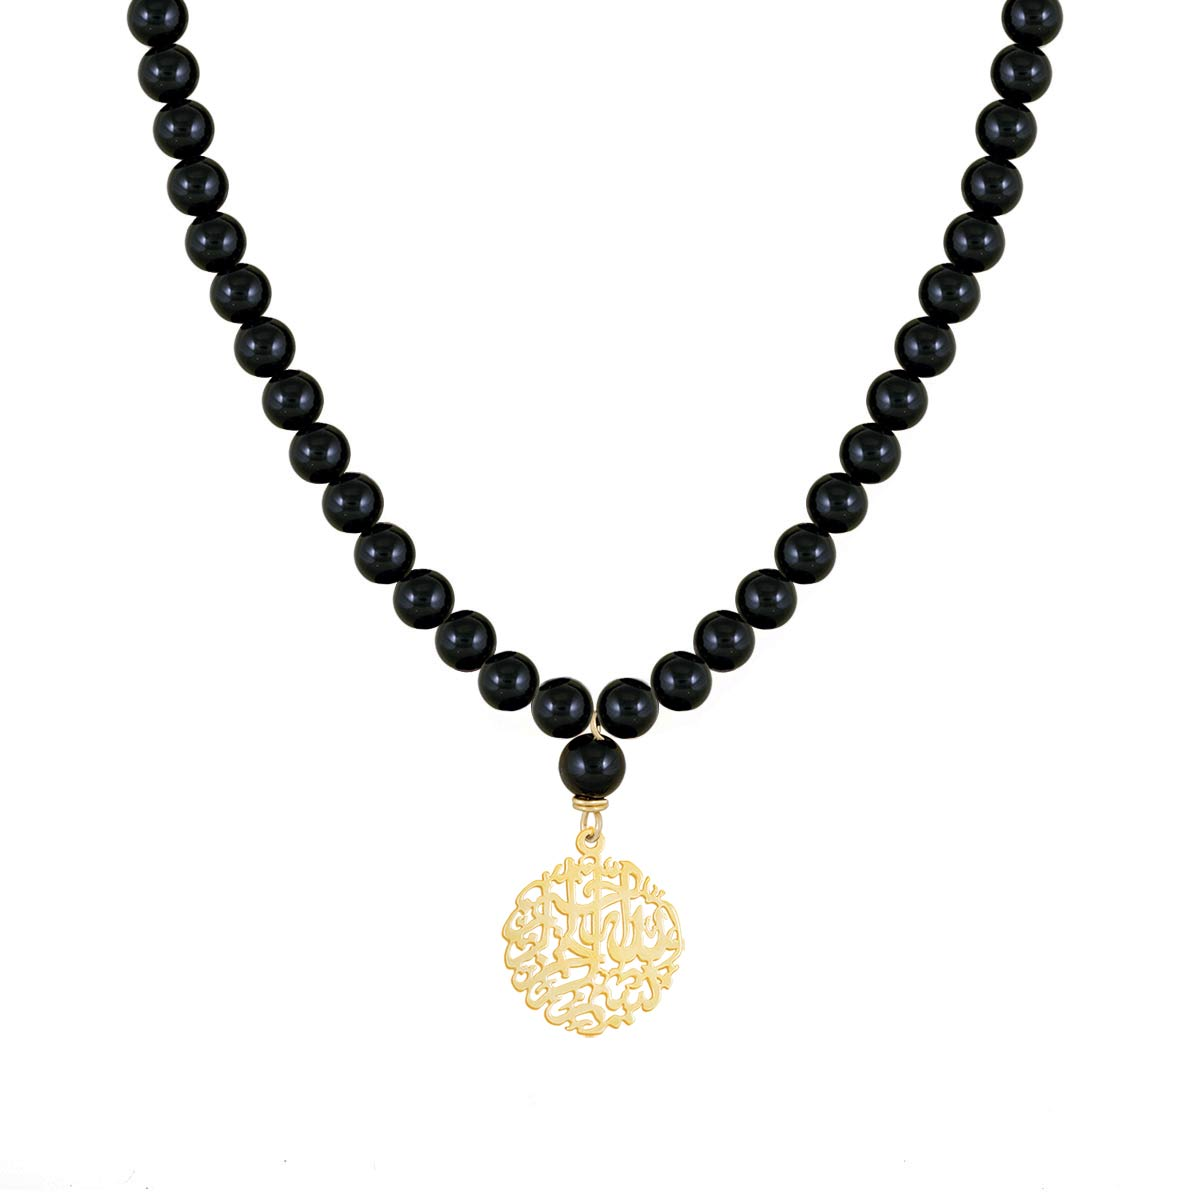 گردنبند طلا بسم الله کوچک